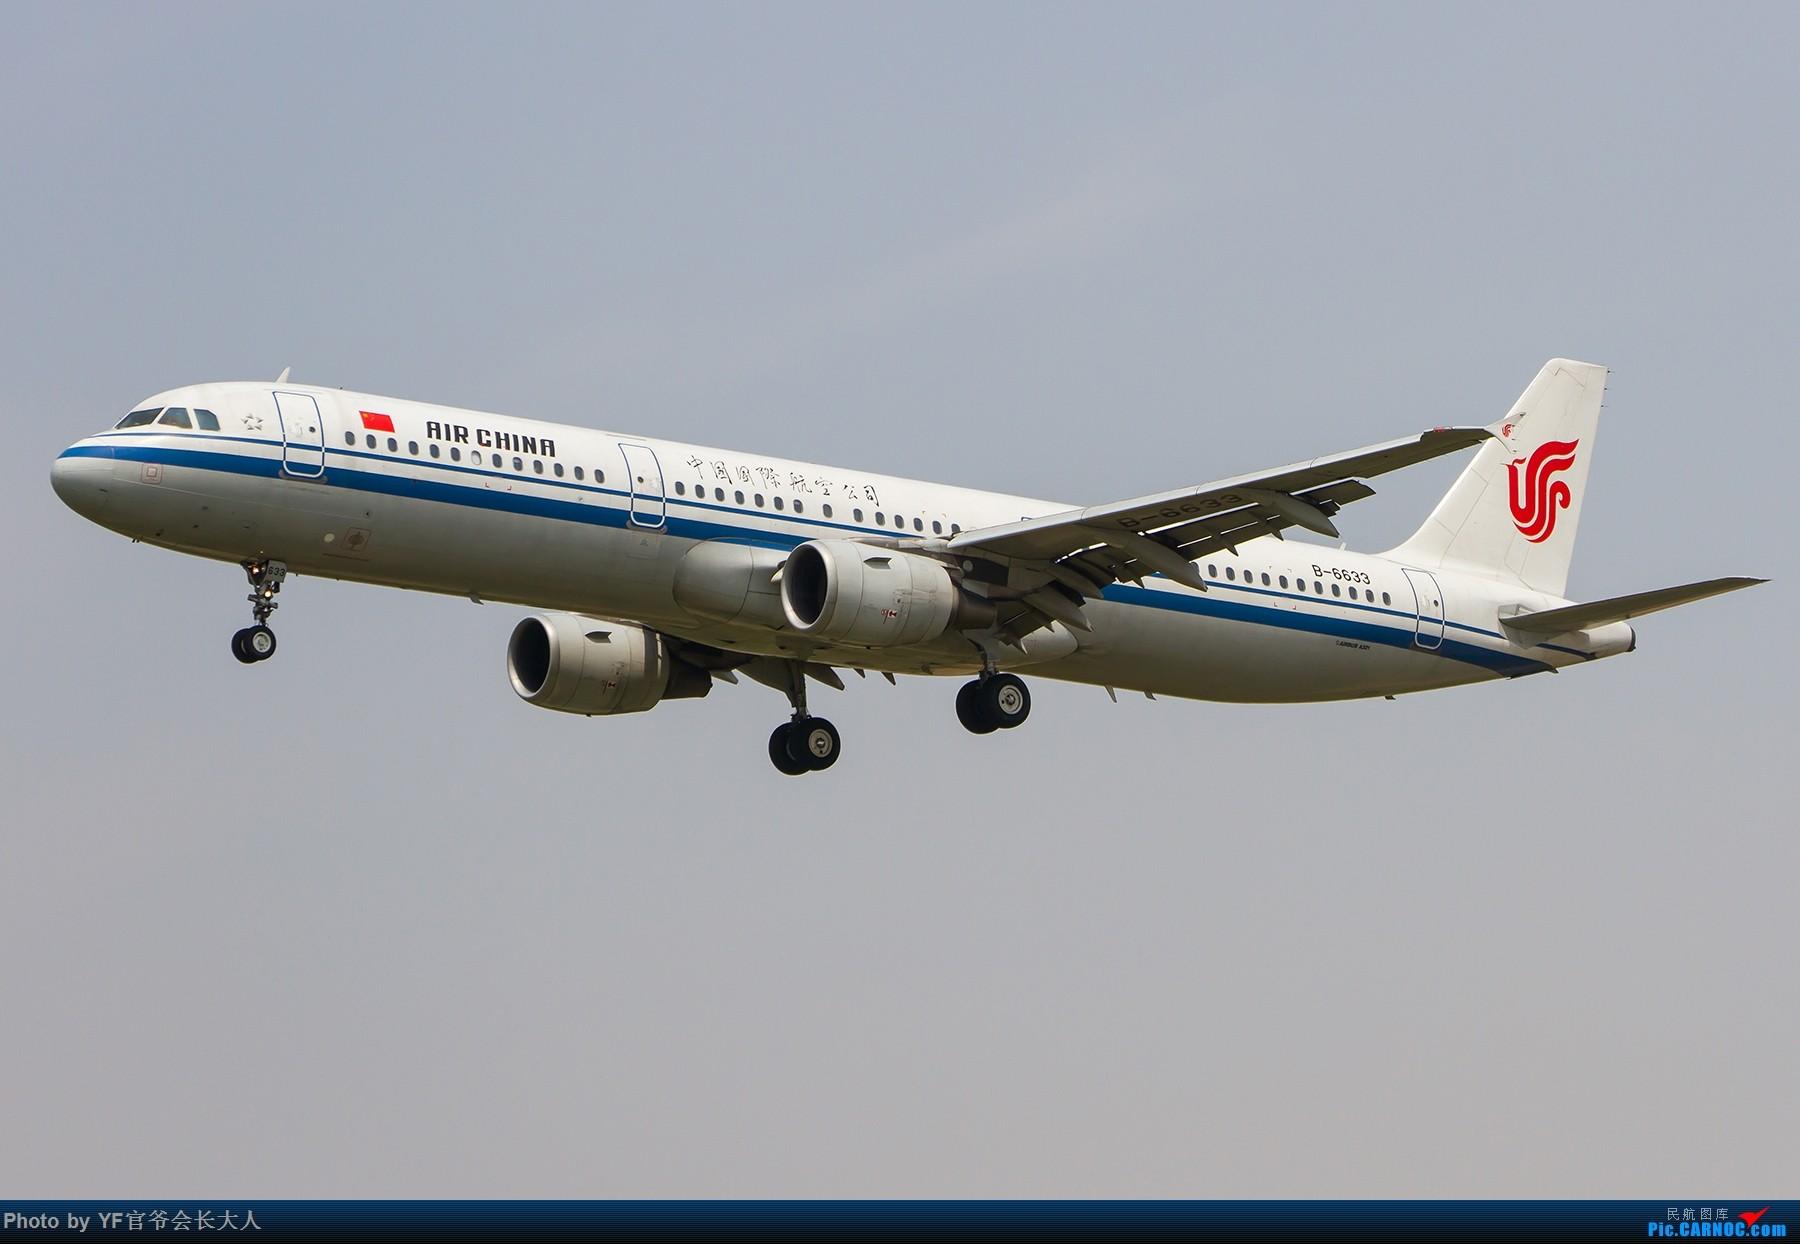 Re:[原创]【ZYTX】轻易不拍机,拍就要拍个过瘾!(新开的酷鸟,亚洲大西洋,顺带碰上朝韩两国的好货) AIRBUS A321-200 B-6633 中国沈阳桃仙国际机场